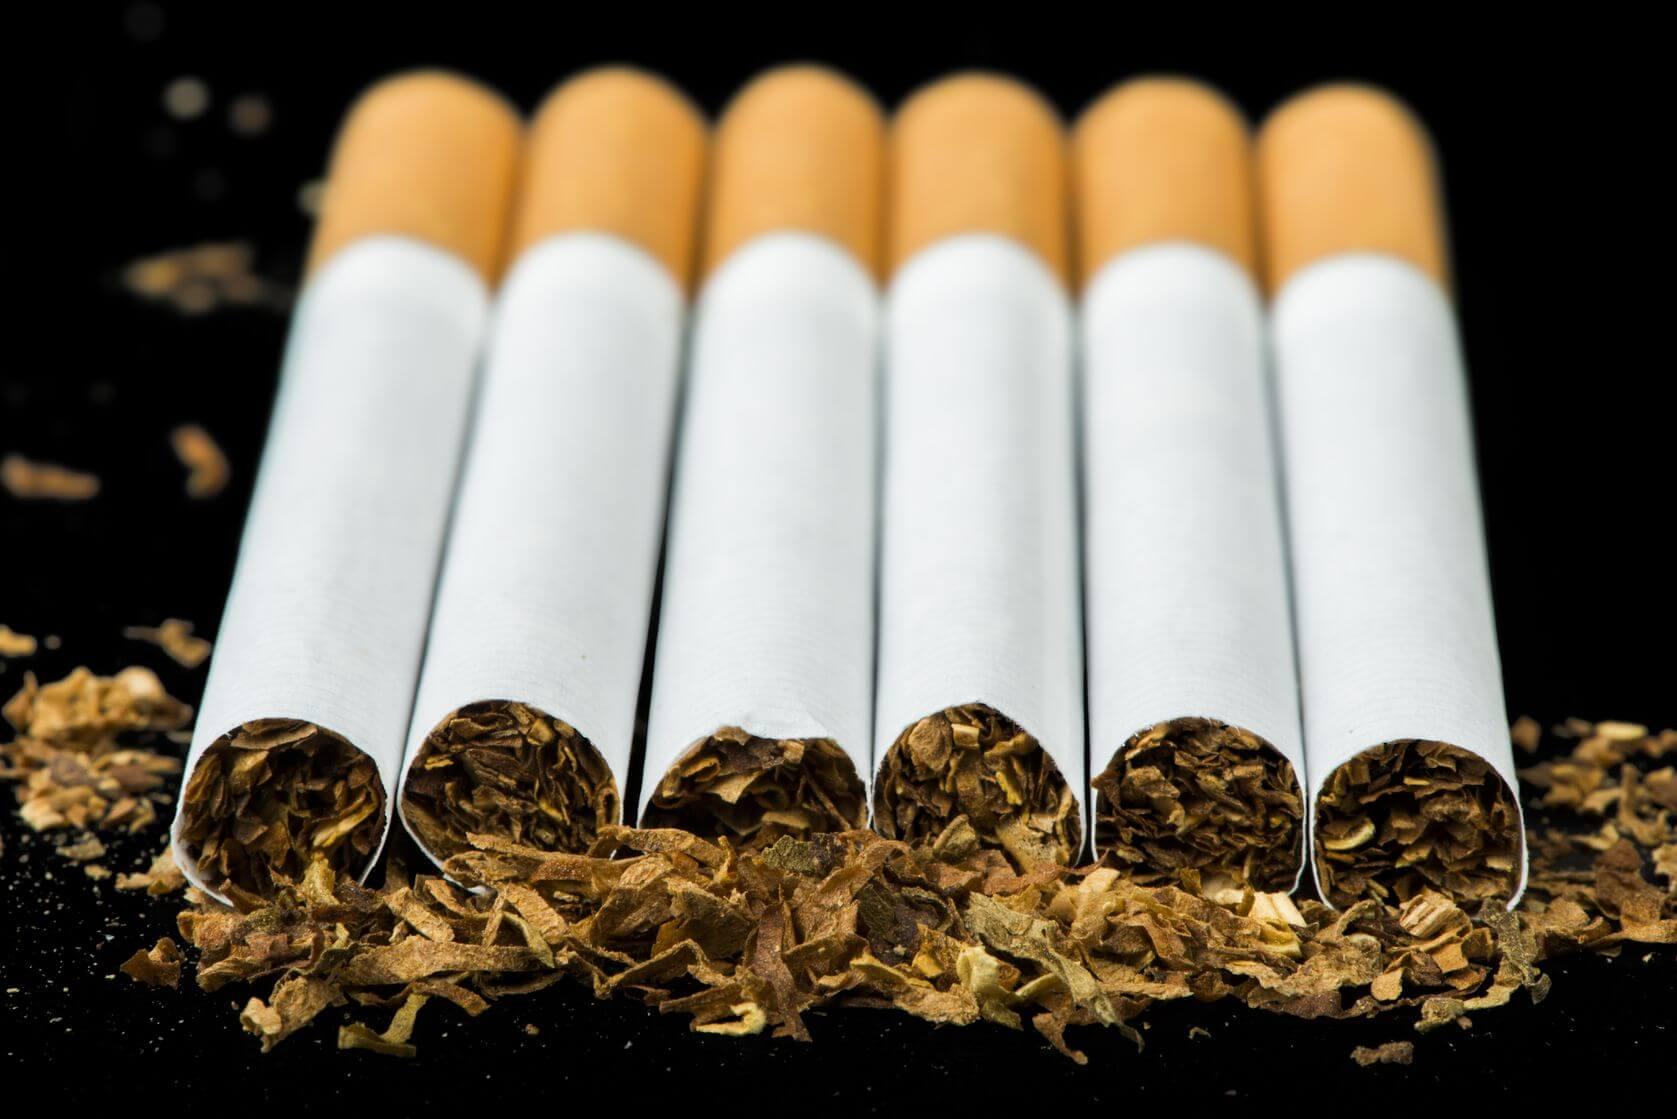 High Resolution Wallpaper | Tobacco 1677x1119 px